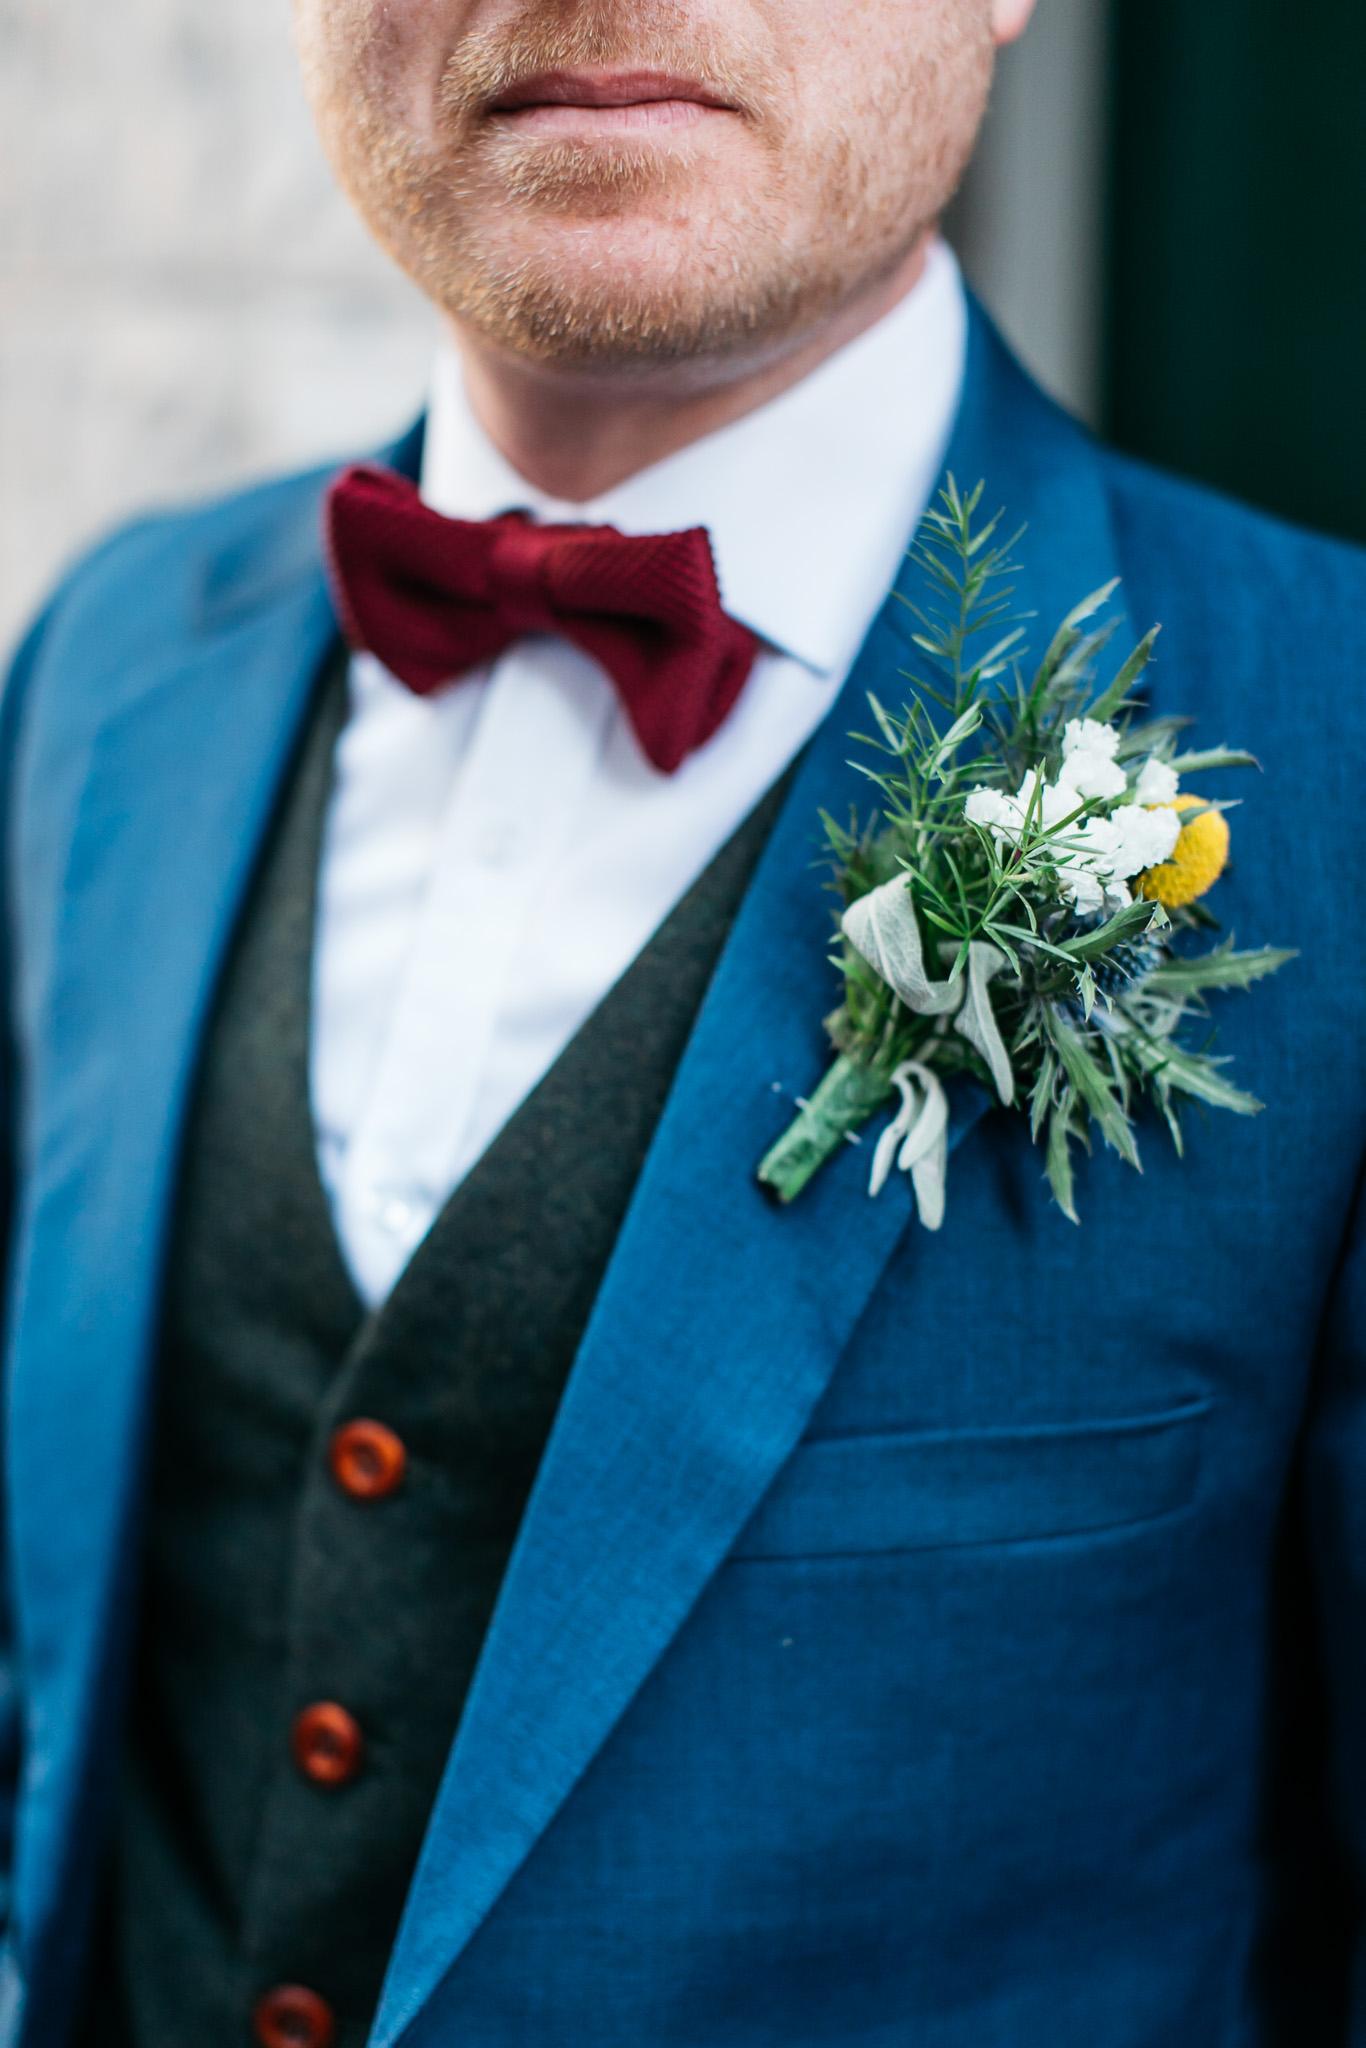 st_andrews_fabrica_brighton_wedding_599.jpg